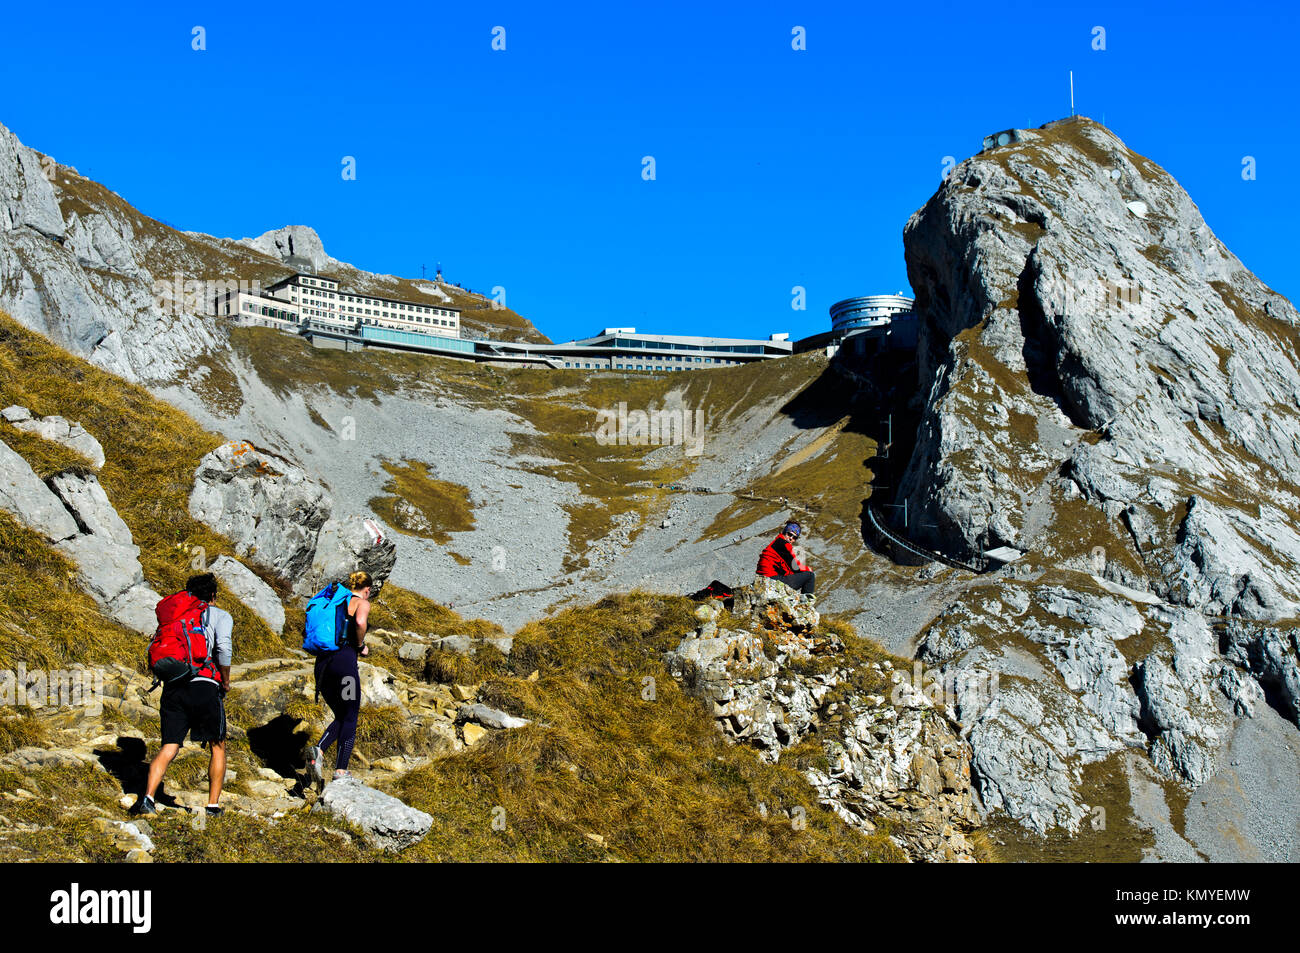 Hikers in the Pilatus massif, behind hotels Pilatus Kulm and Pilatus Bellevue, peak Esel, Alpnachstad, Switzerland - Stock Image